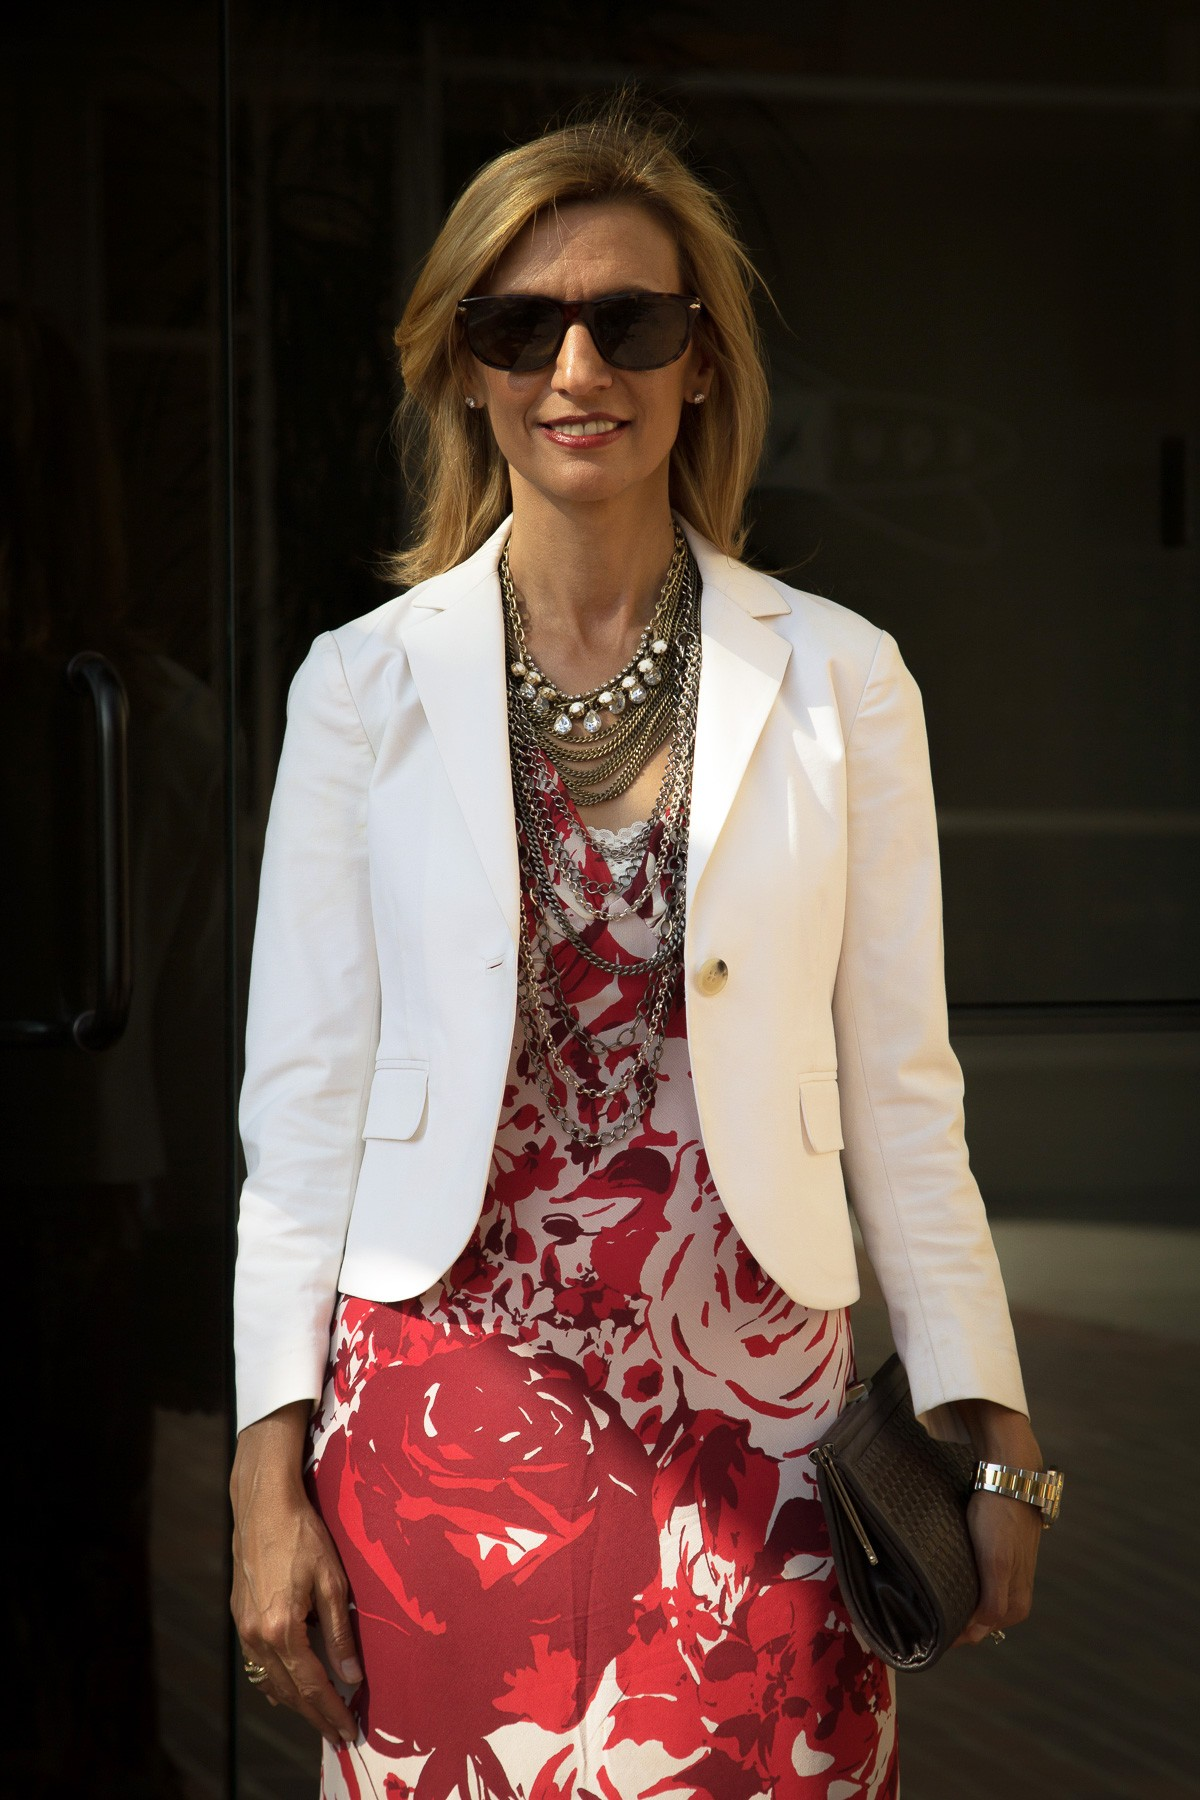 Wearing-My-Shrunken-Blazer-As-A-Cardigan-www.jacketsociety.com-2